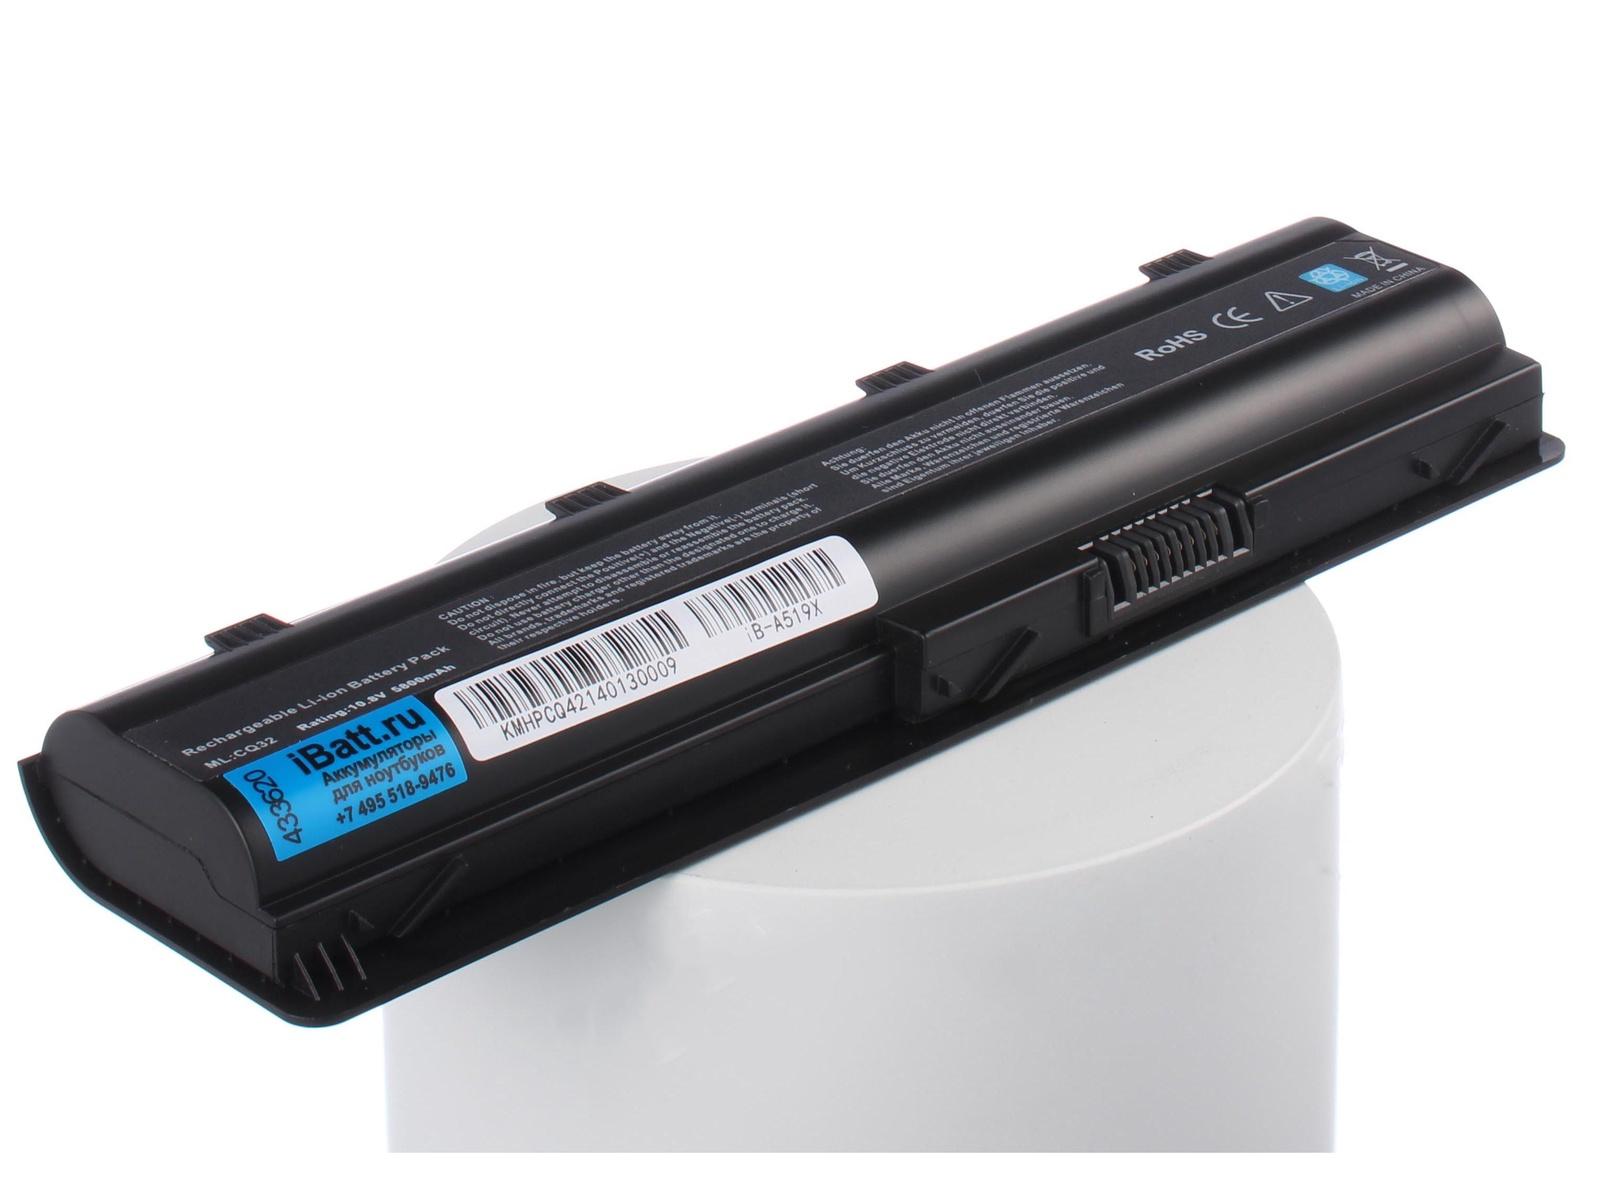 Аккумулятор для ноутбука iBatt для HP-Compaq Pavilion g7-1310er, Pavilion g7-2159sr, Presario CQ58-127SR, 630 A1D72EA, G62-100, Pavilion dv6-3055sr, Pavilion dv6-3075er, Pavilion dv6-3085er, Pavilion dv6-6c34sr